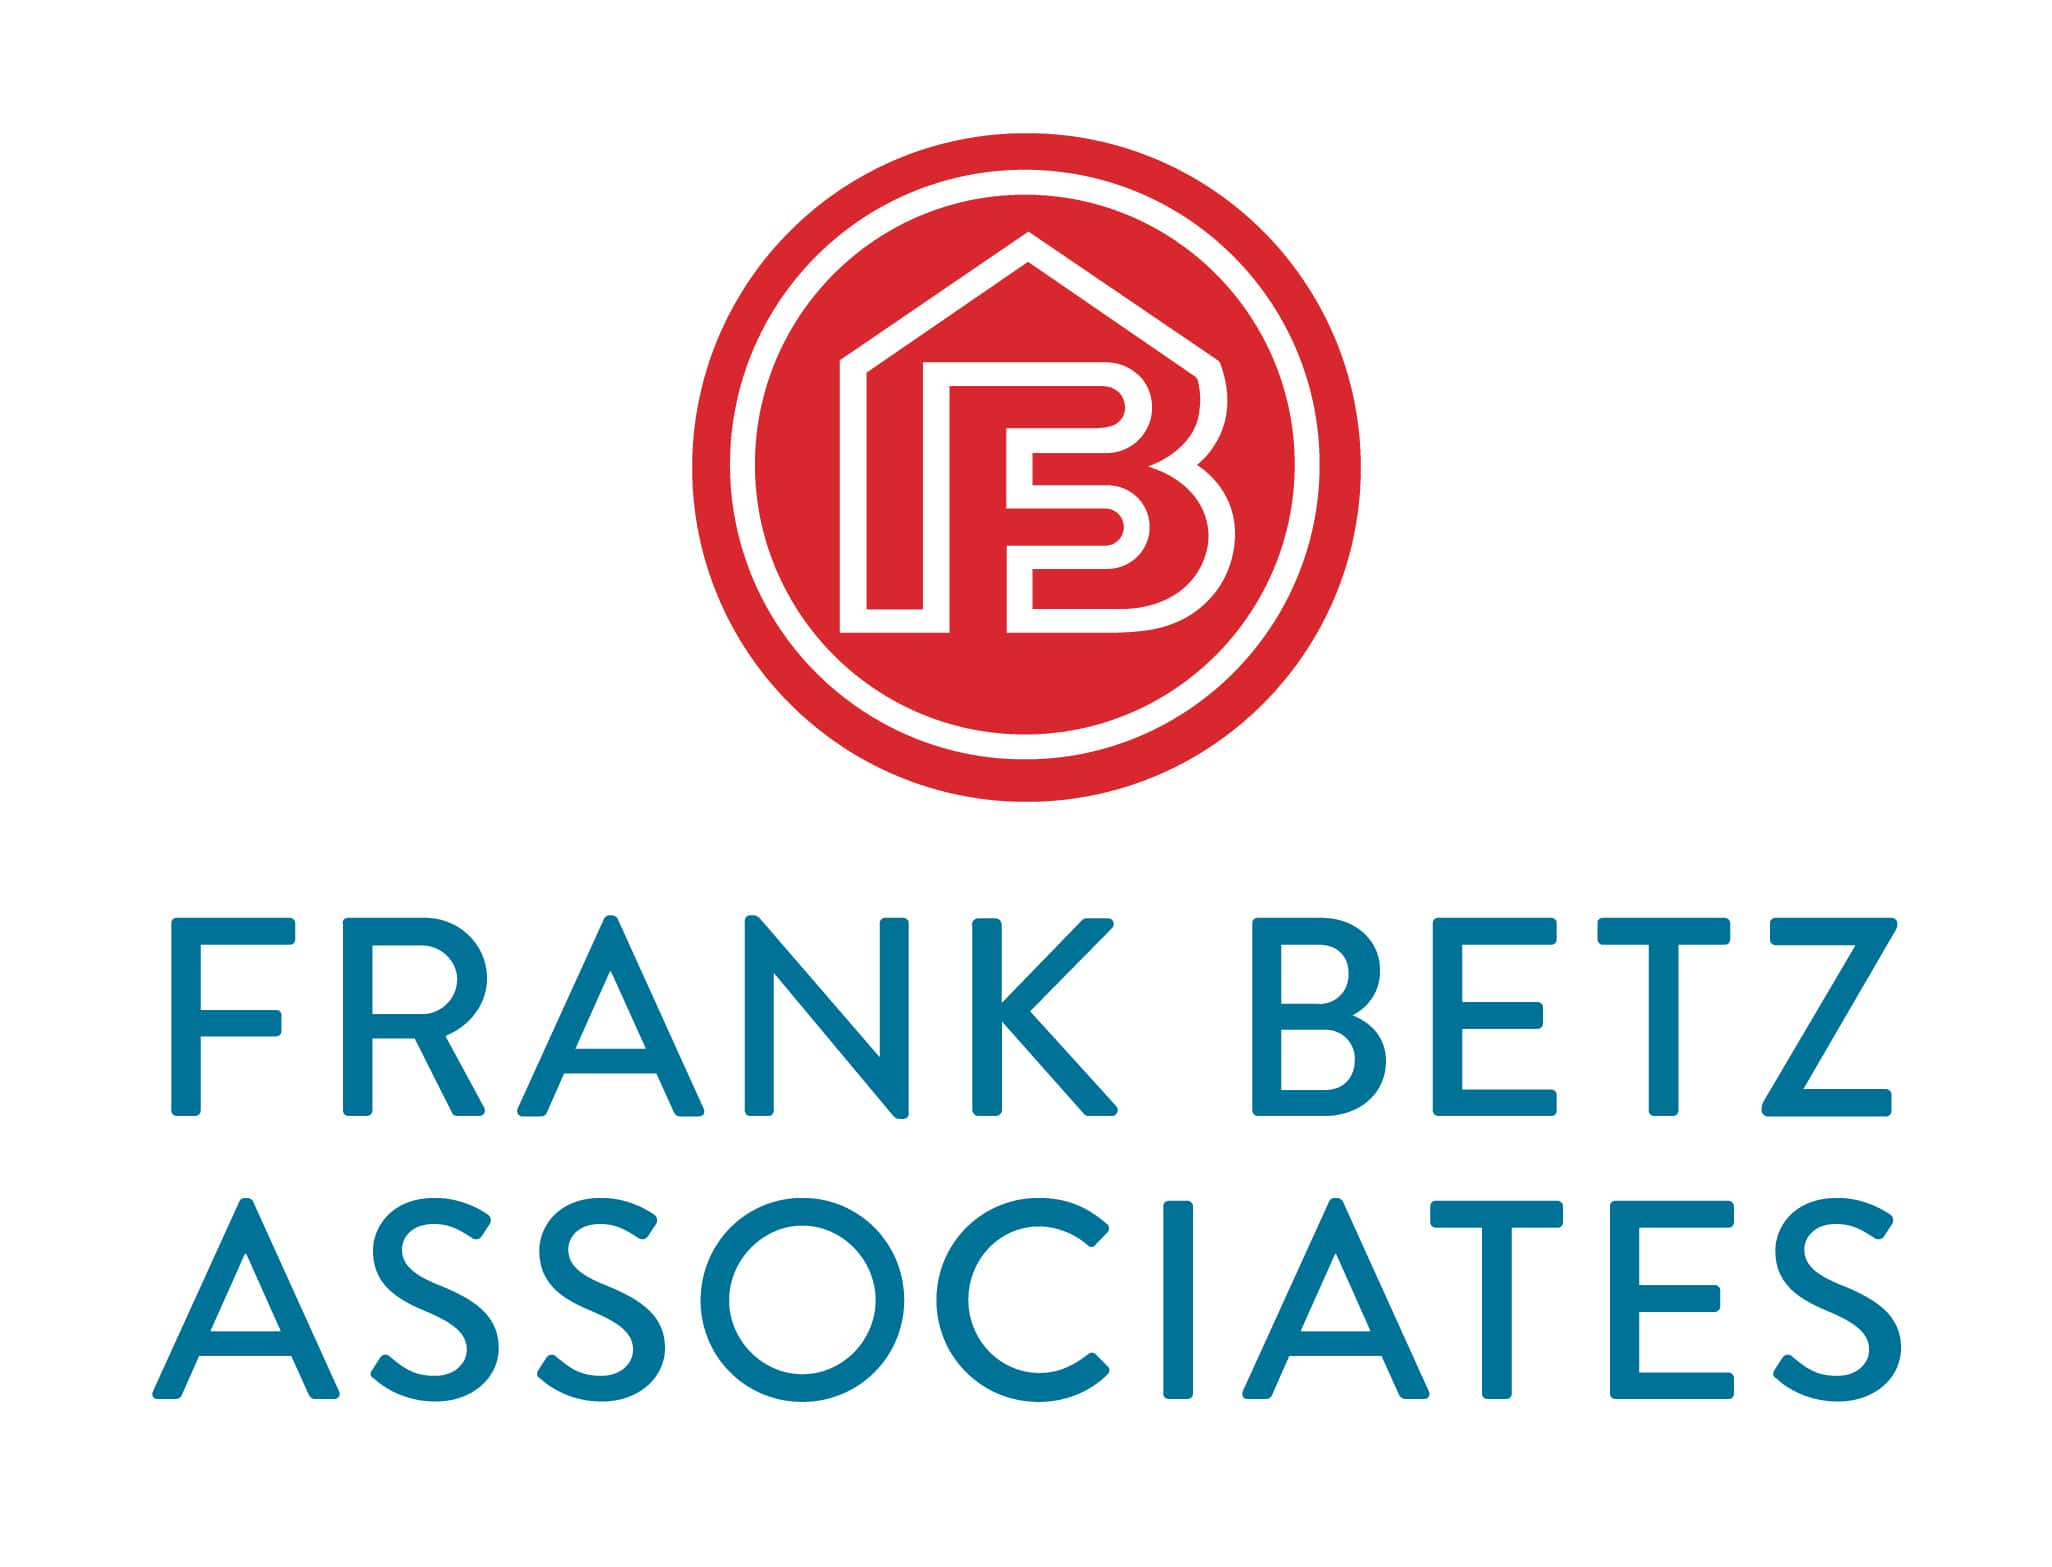 Frank_Betz_Logo-min.jpg